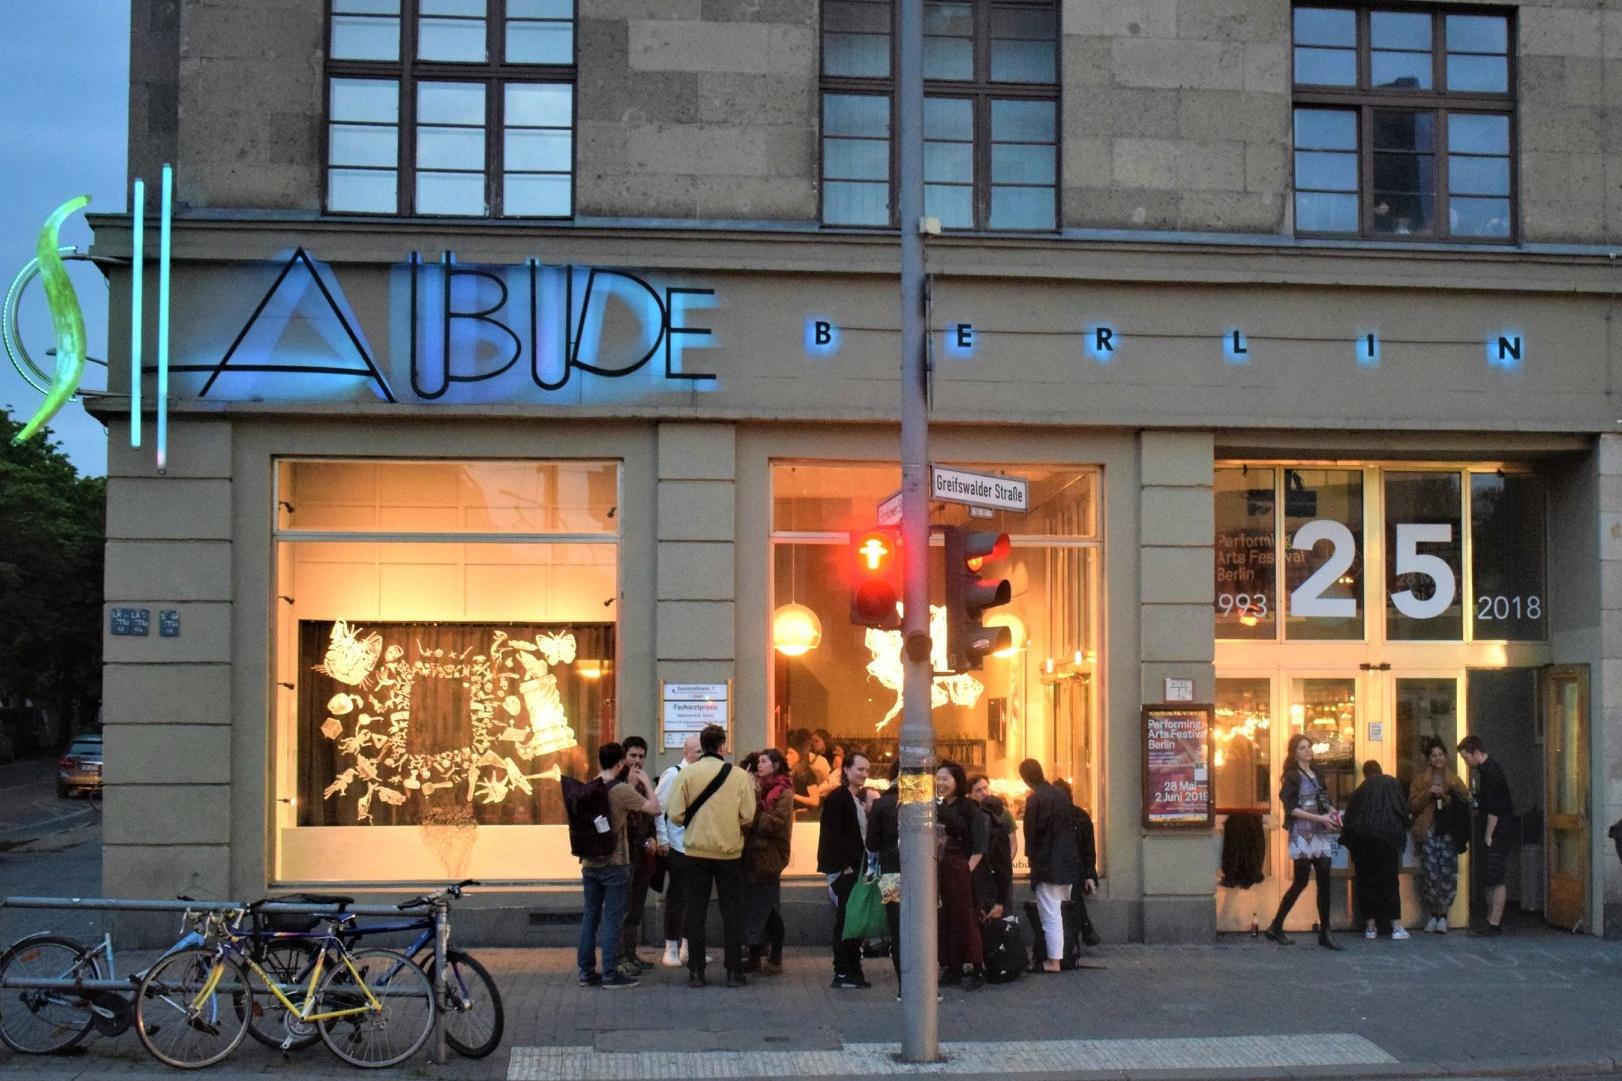 Front Schaubude Berlin